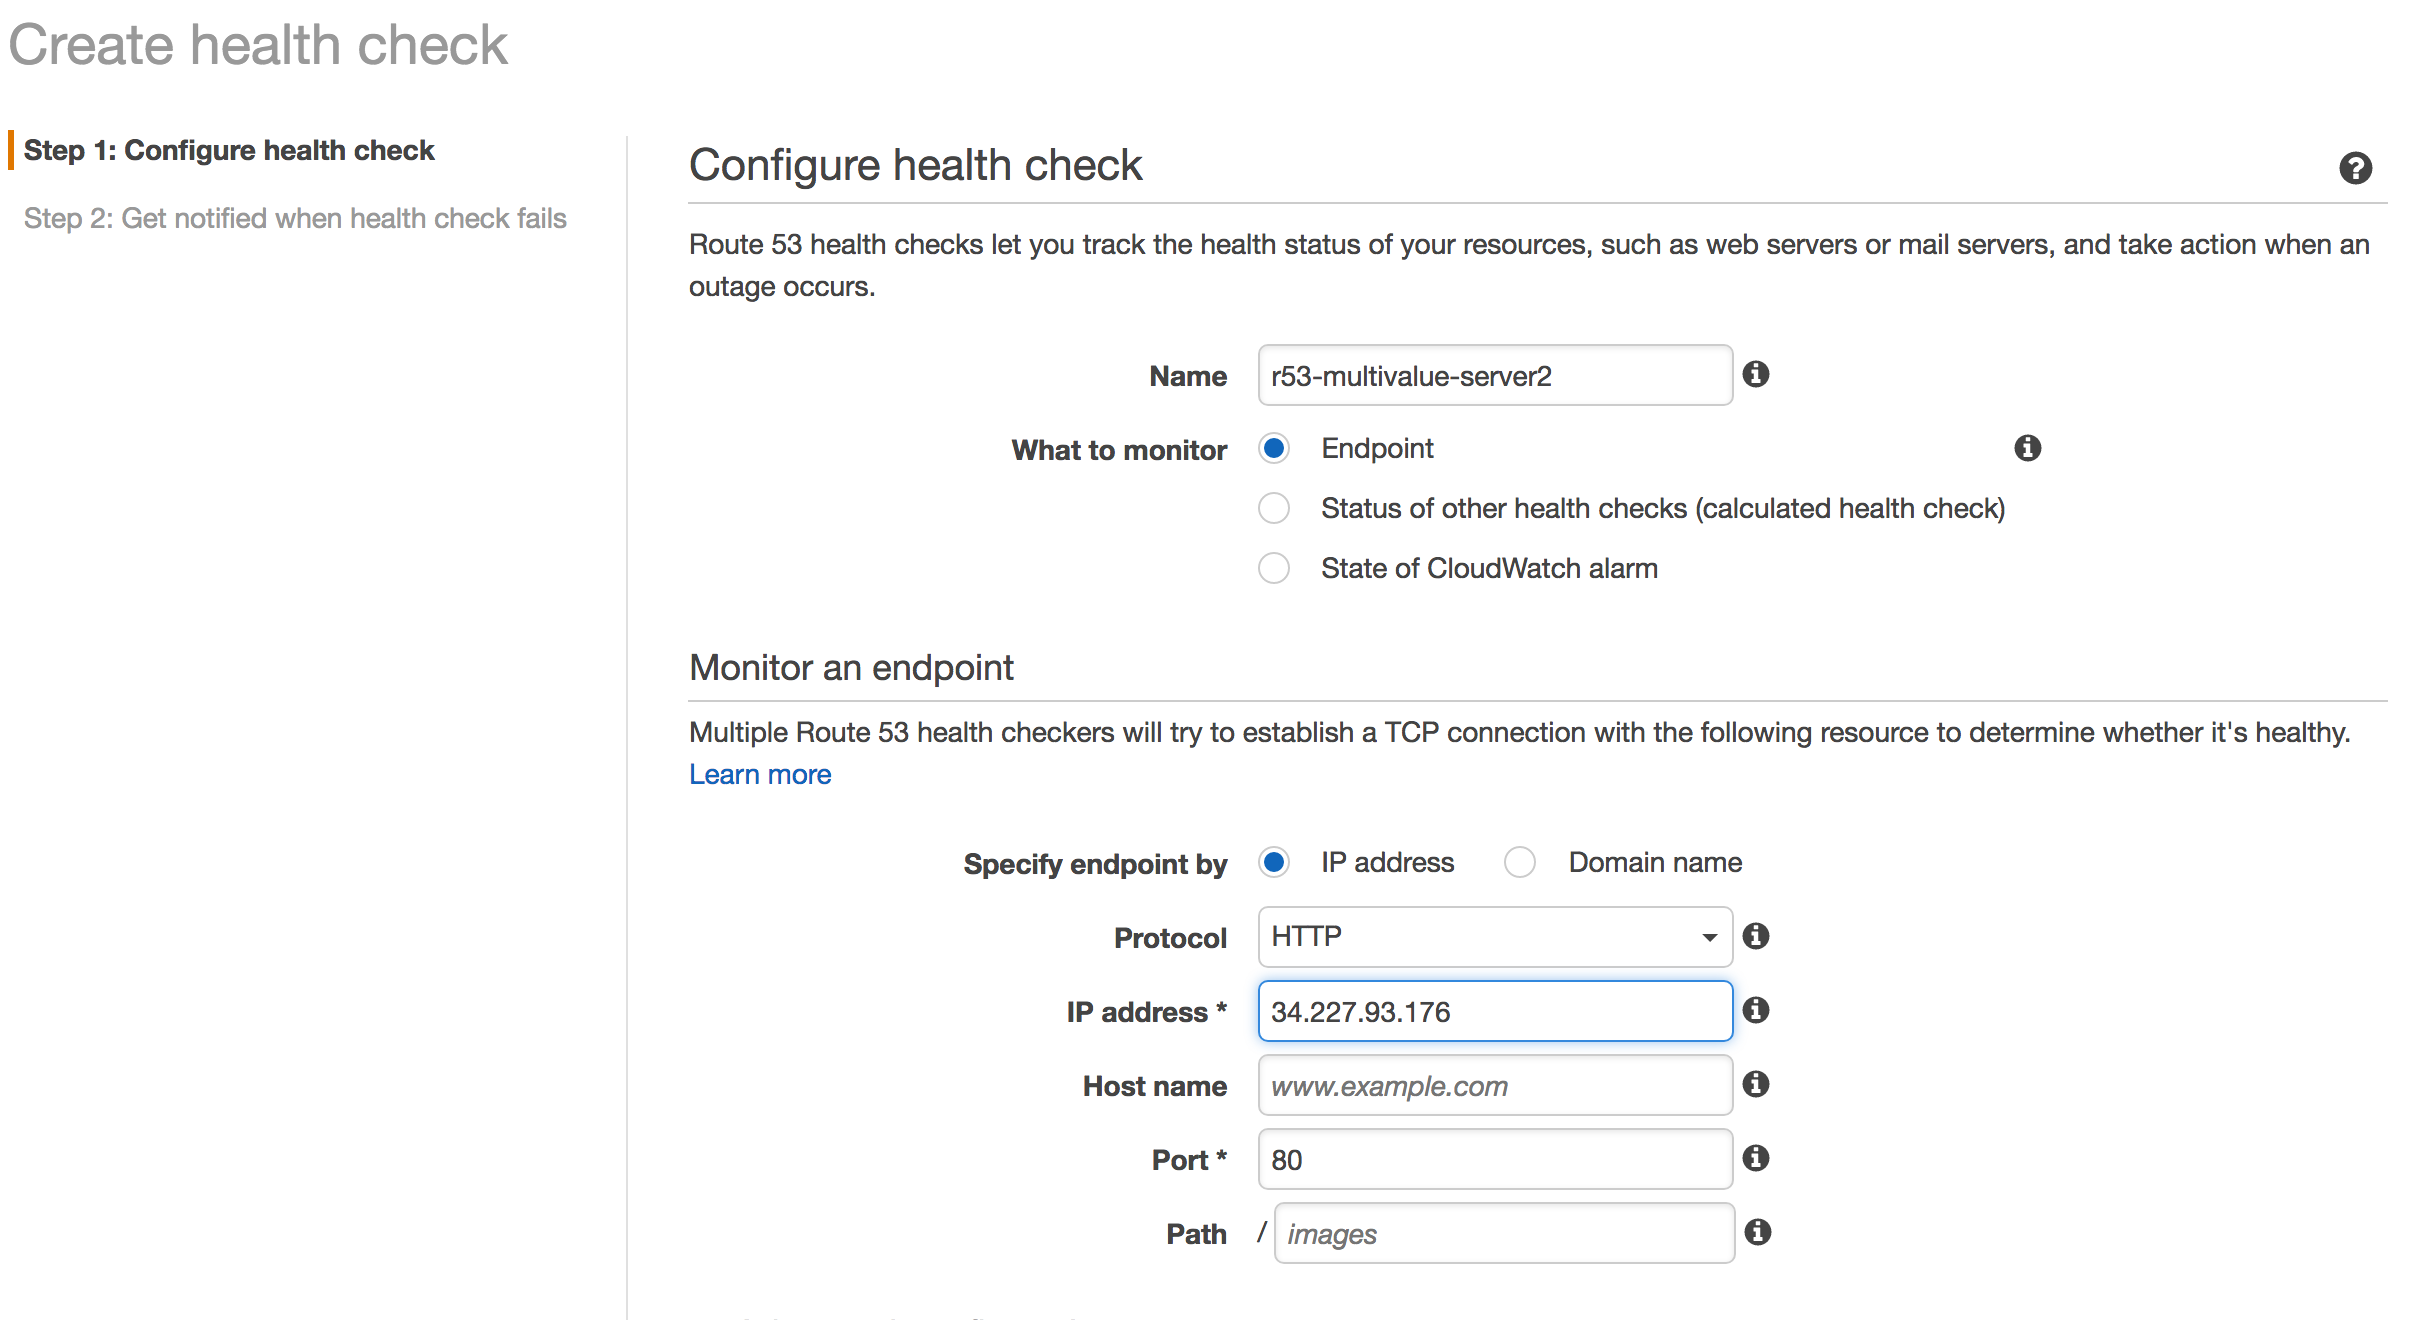 Health check server 2